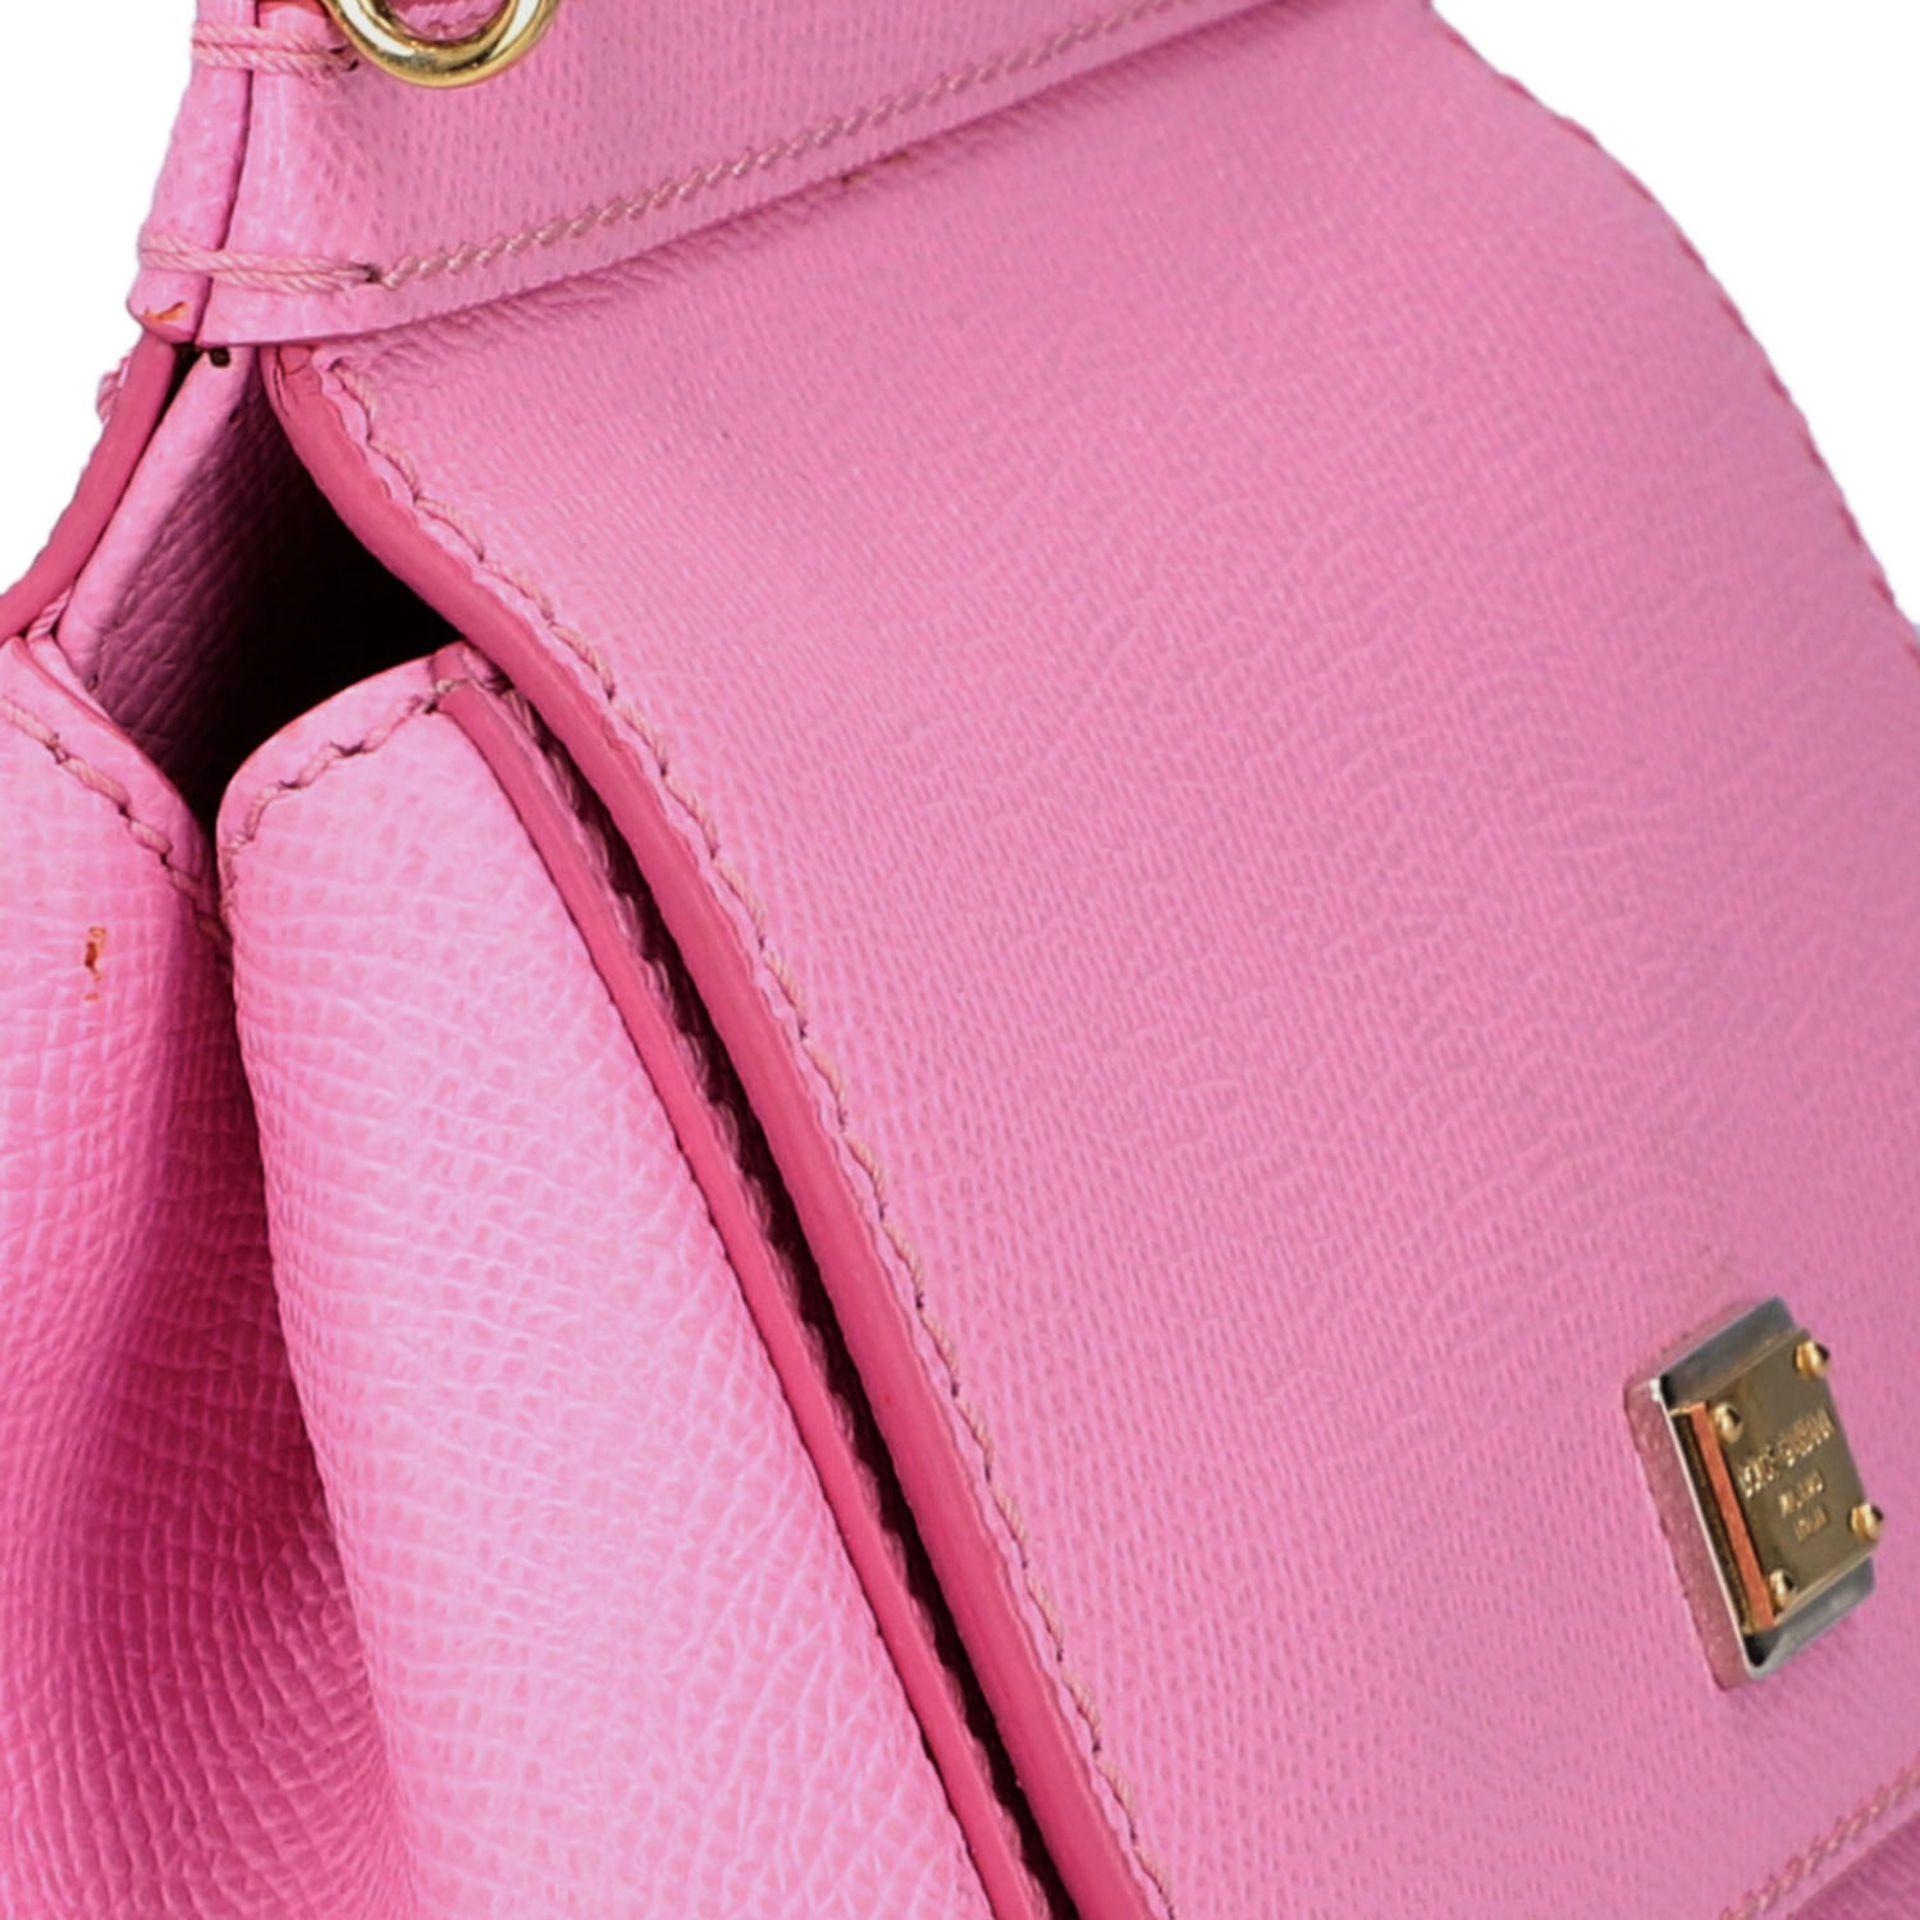 "DOLCE & GABBANA Handtasche ""MINI SICILY"", akt. NP.: 1.150,-€.Fein genarbtes Leder in - Image 8 of 8"